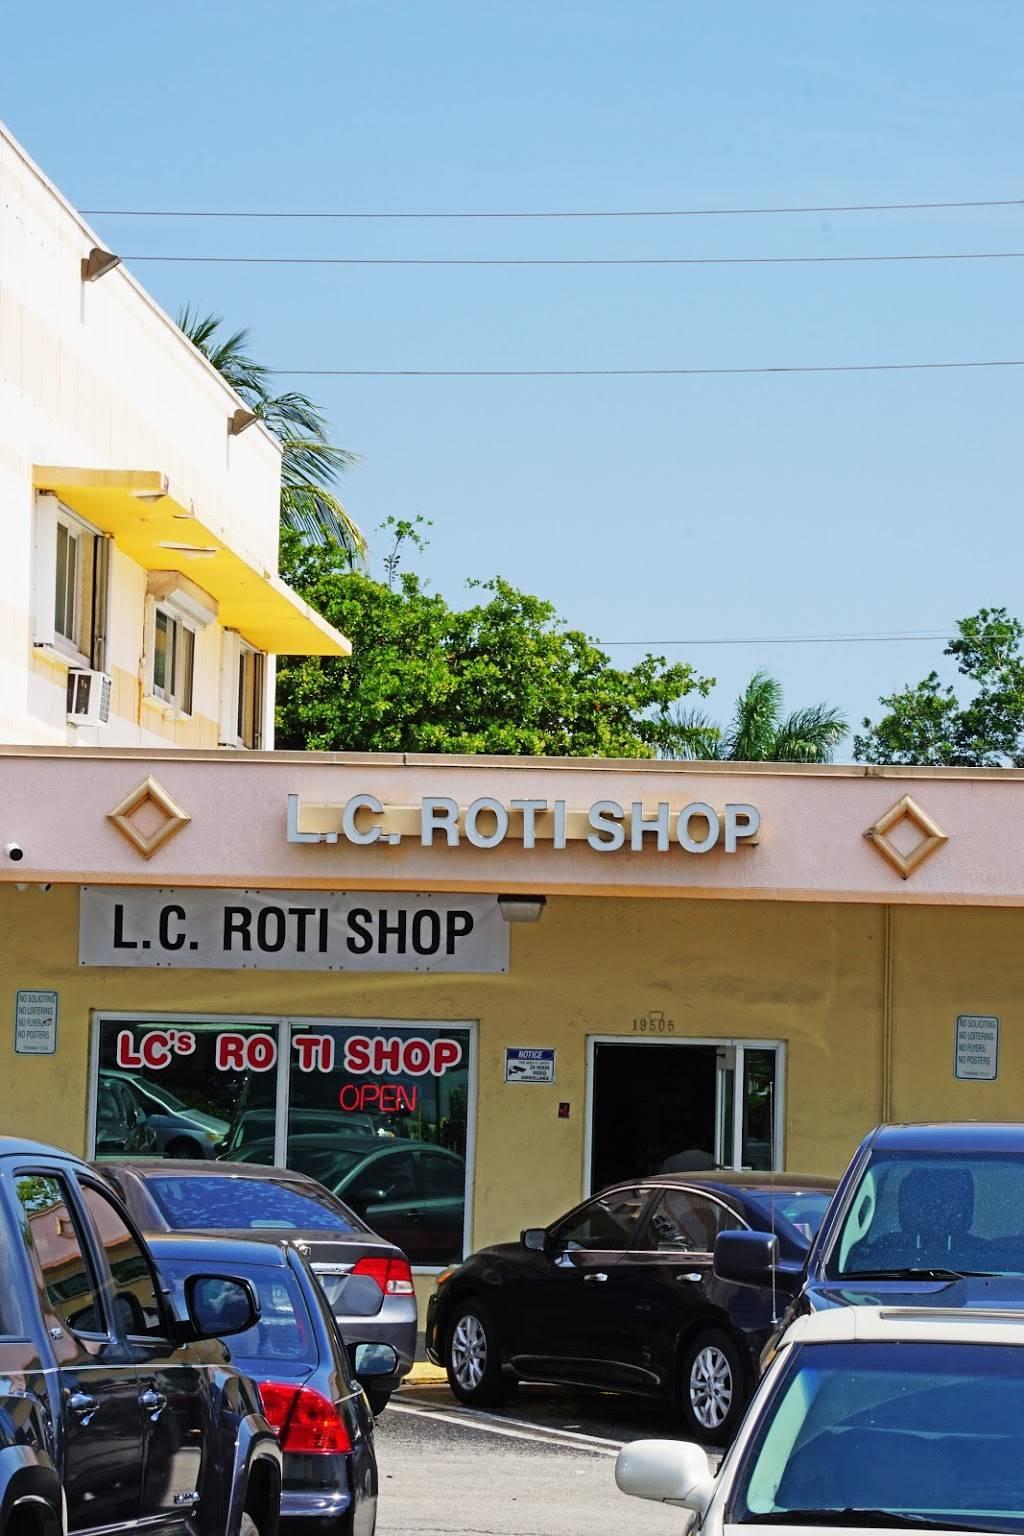 L C Roti Shop - restaurant  | Photo 1 of 7 | Address: 19505 NW 2nd Ave, Miami, FL 33169, USA | Phone: (305) 651-8924